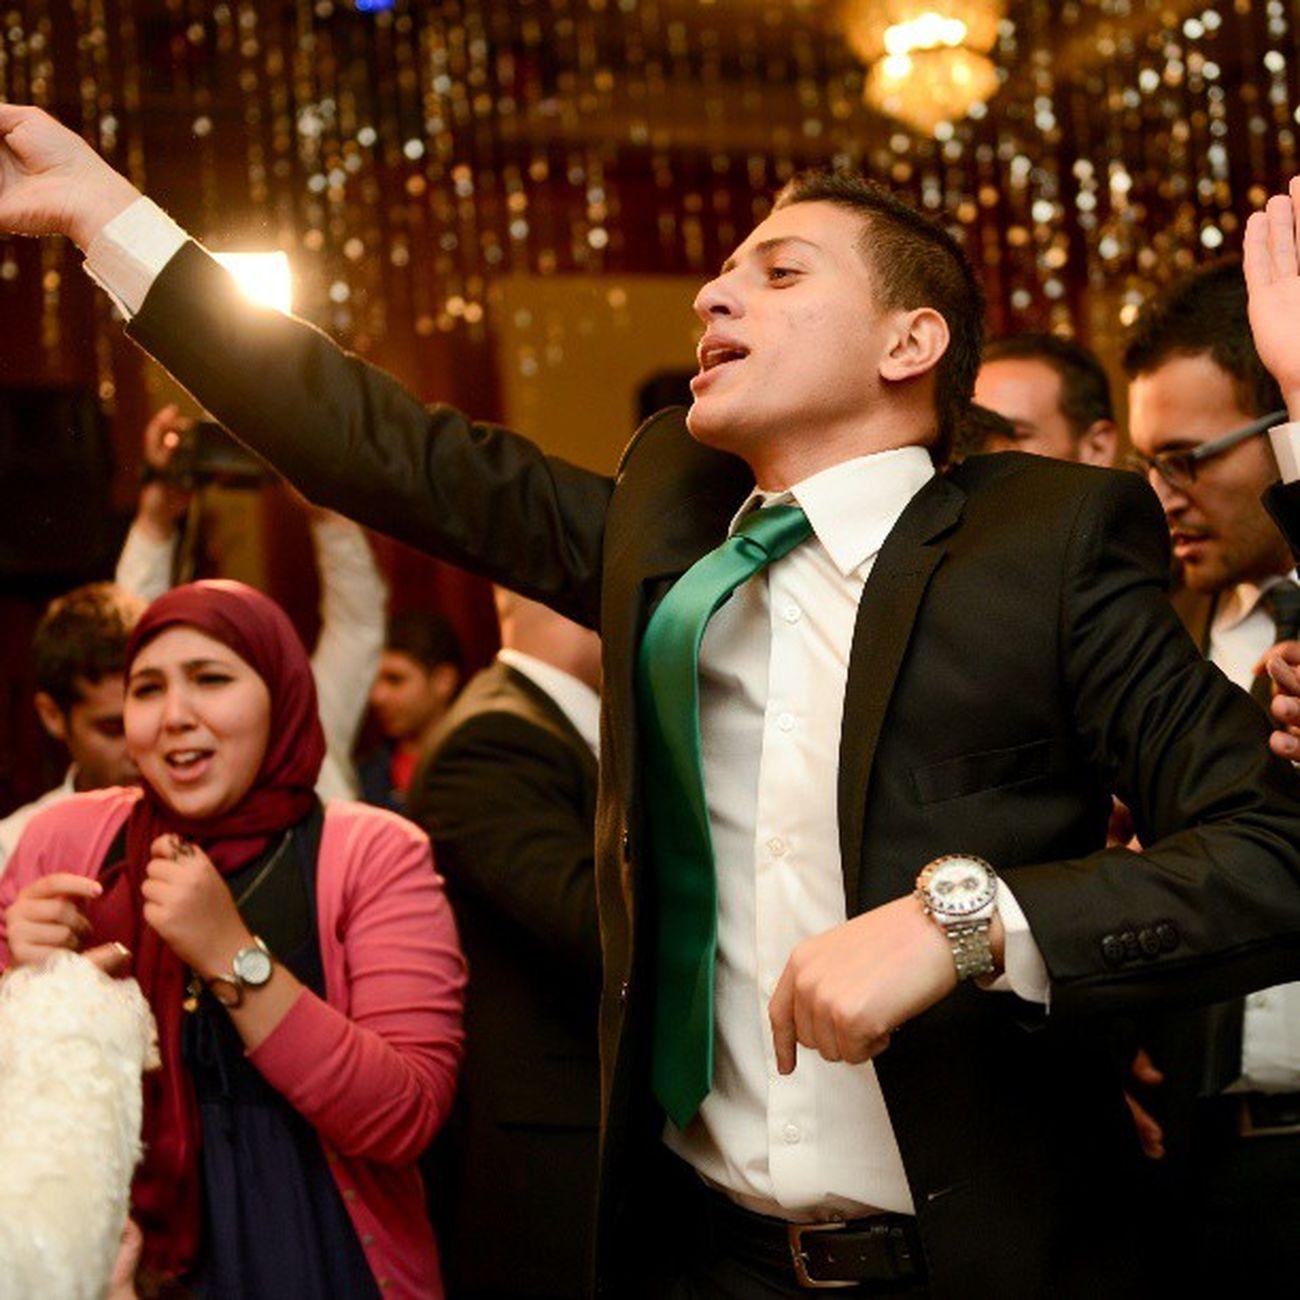 Nennsh Brother Habiby Genan ba3sha2ak suit dance instarwshana